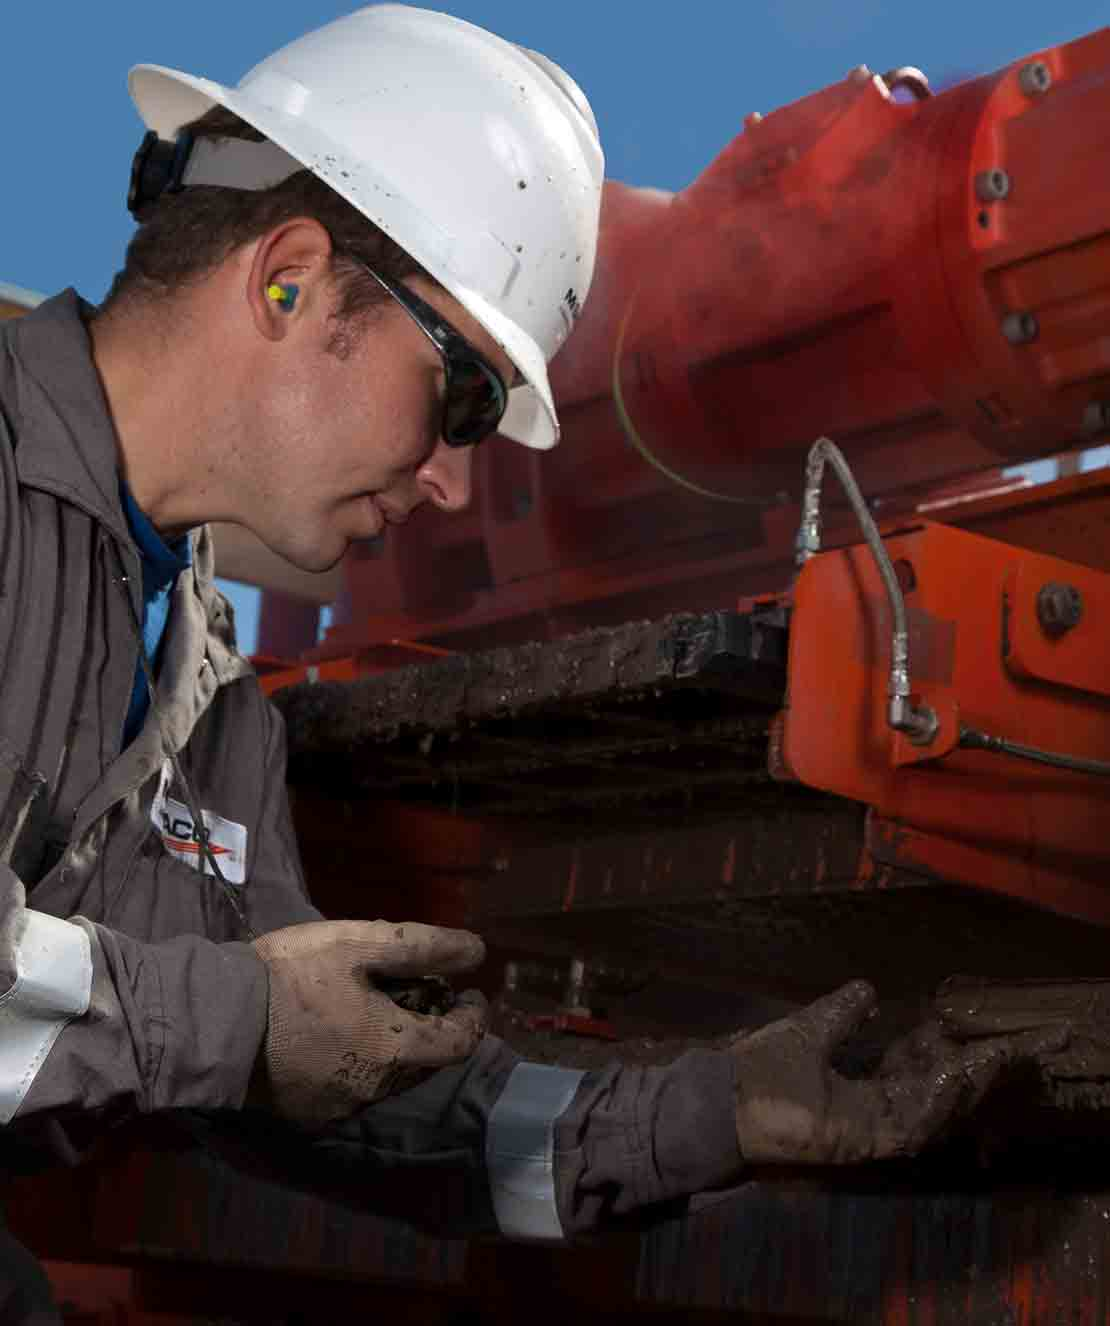 Man Performance Maintenance Checks on MD-2 Shale Shaker